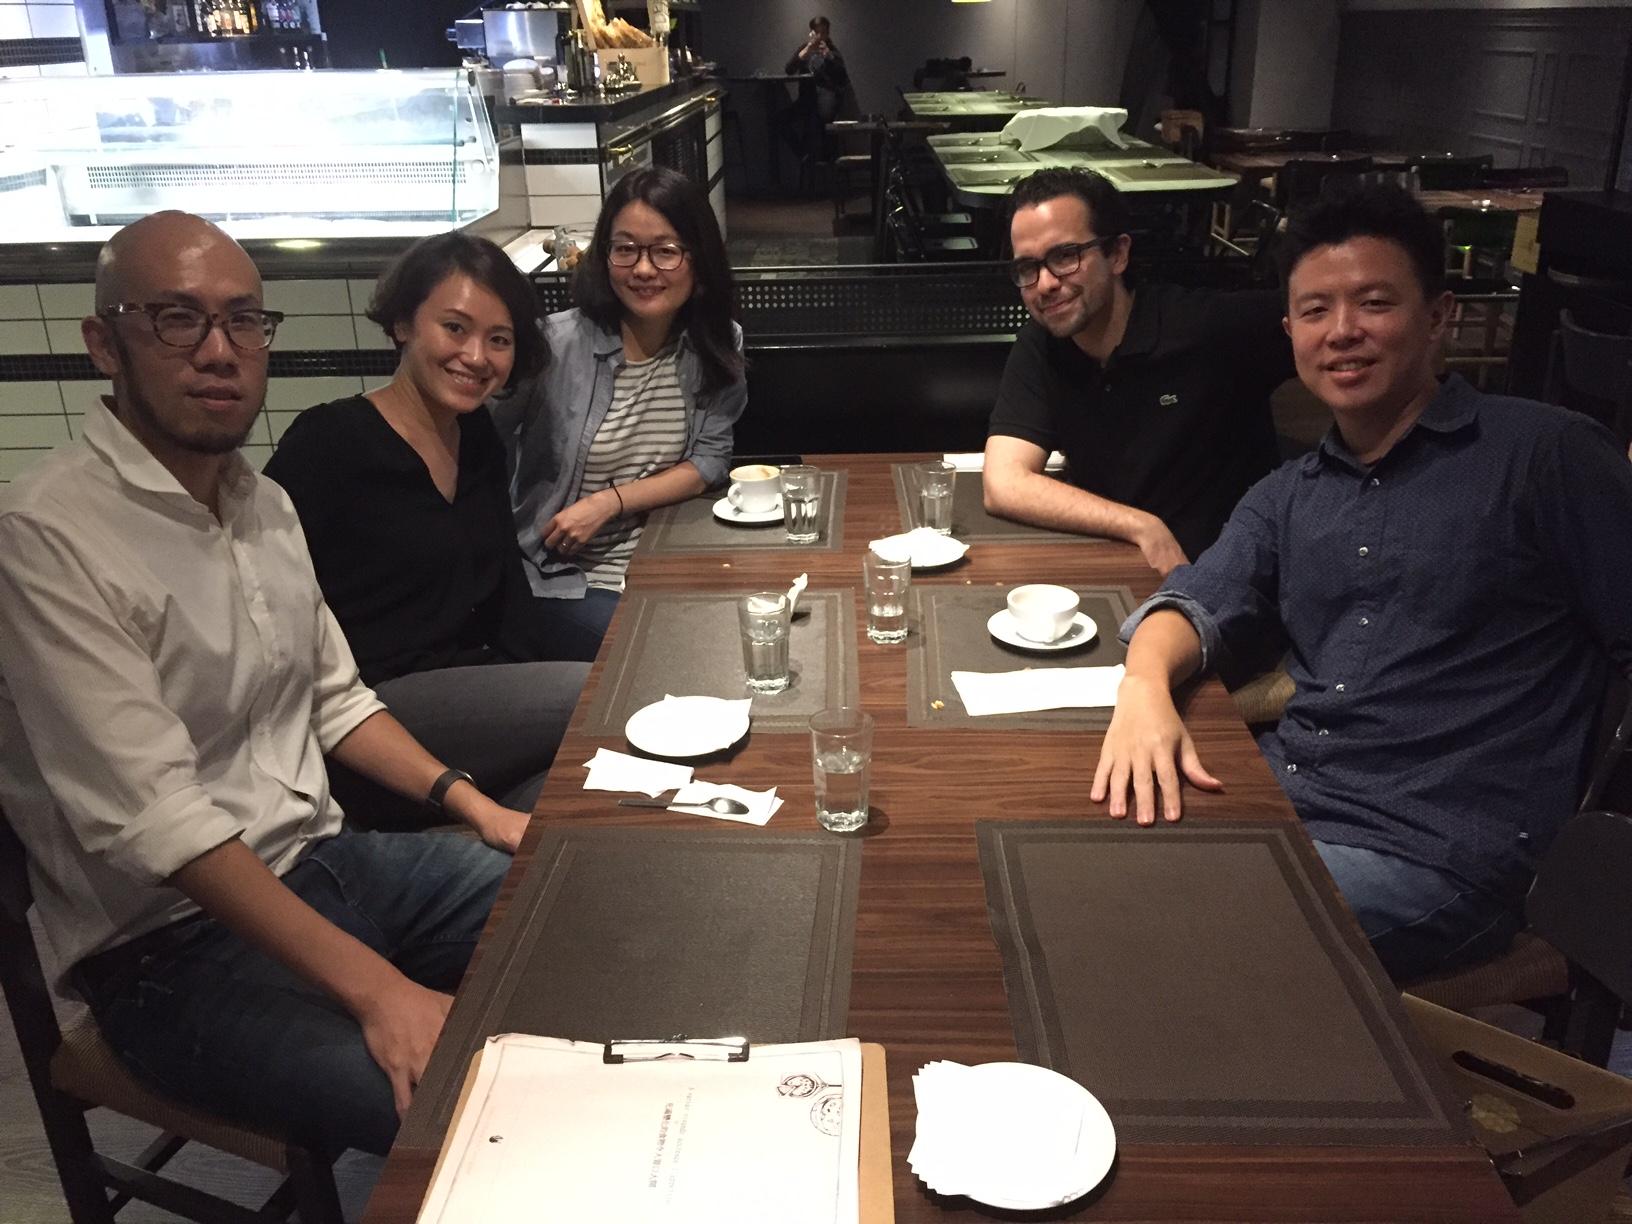 From Left to Right: Tenniel Liu, Tina Wu, Diane Shin,  Alisan Atvur  , and   Mike Wu  .